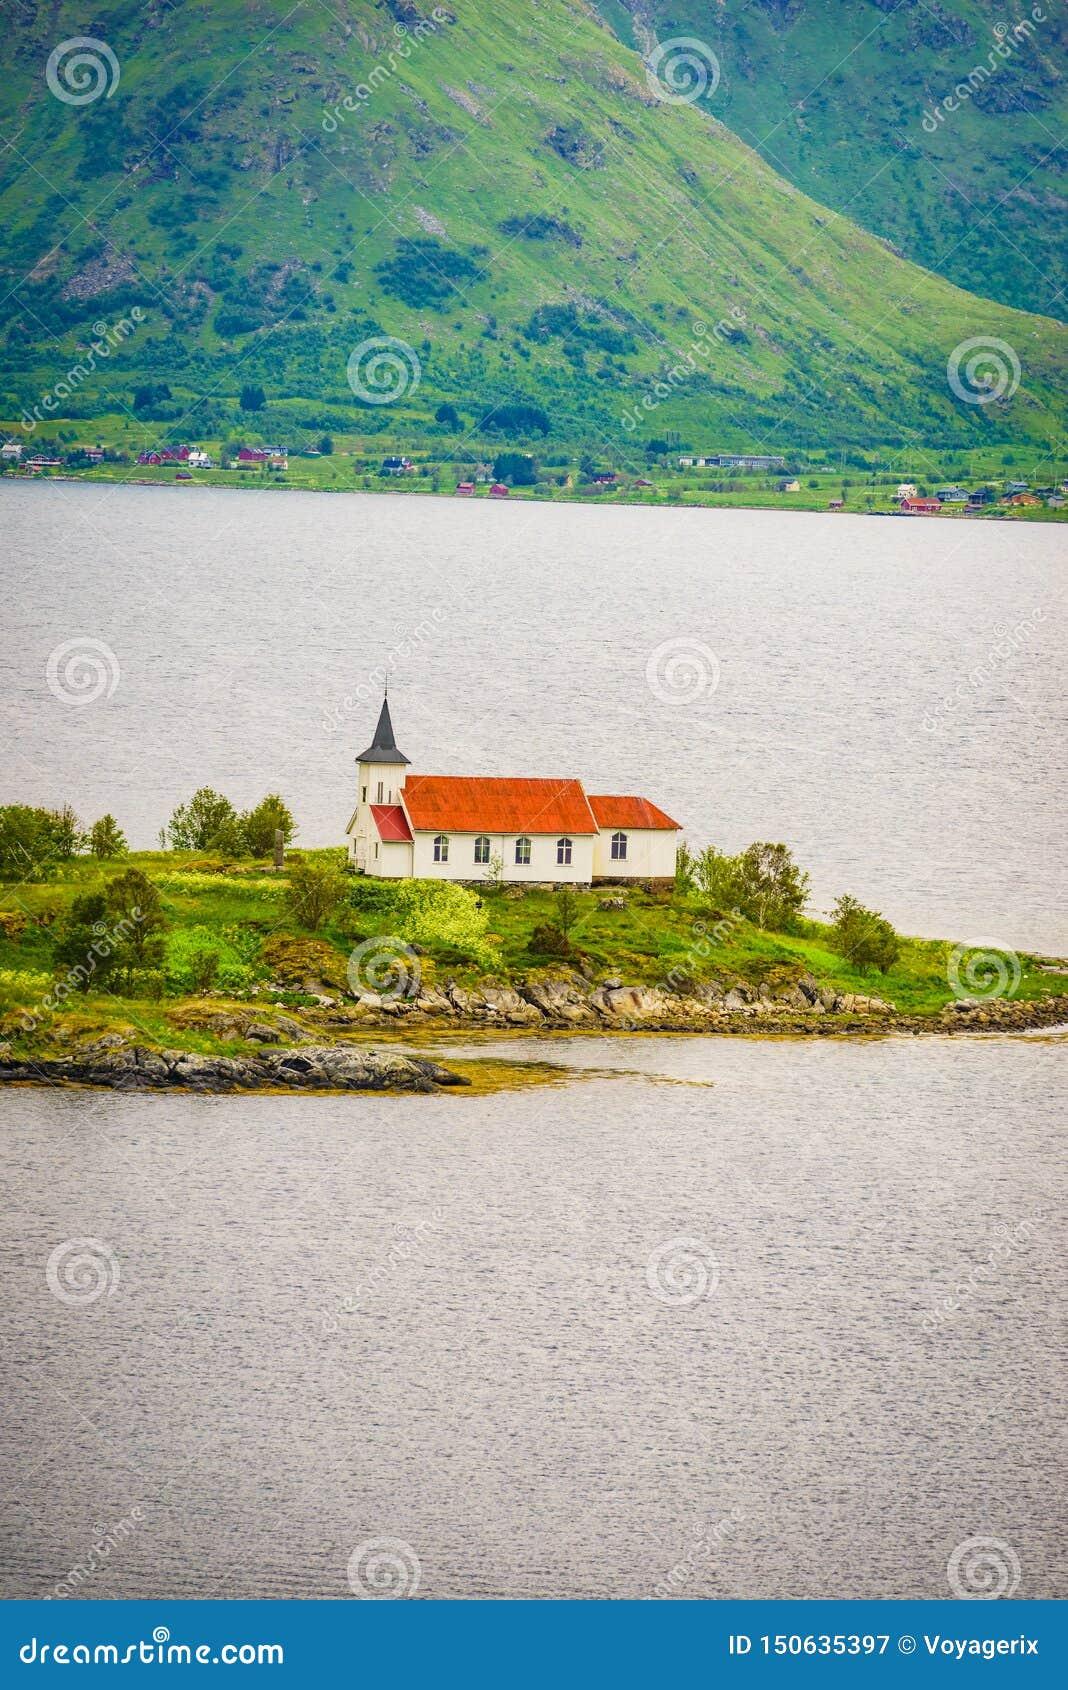 Fjord landscape with church. Lofoten Norway